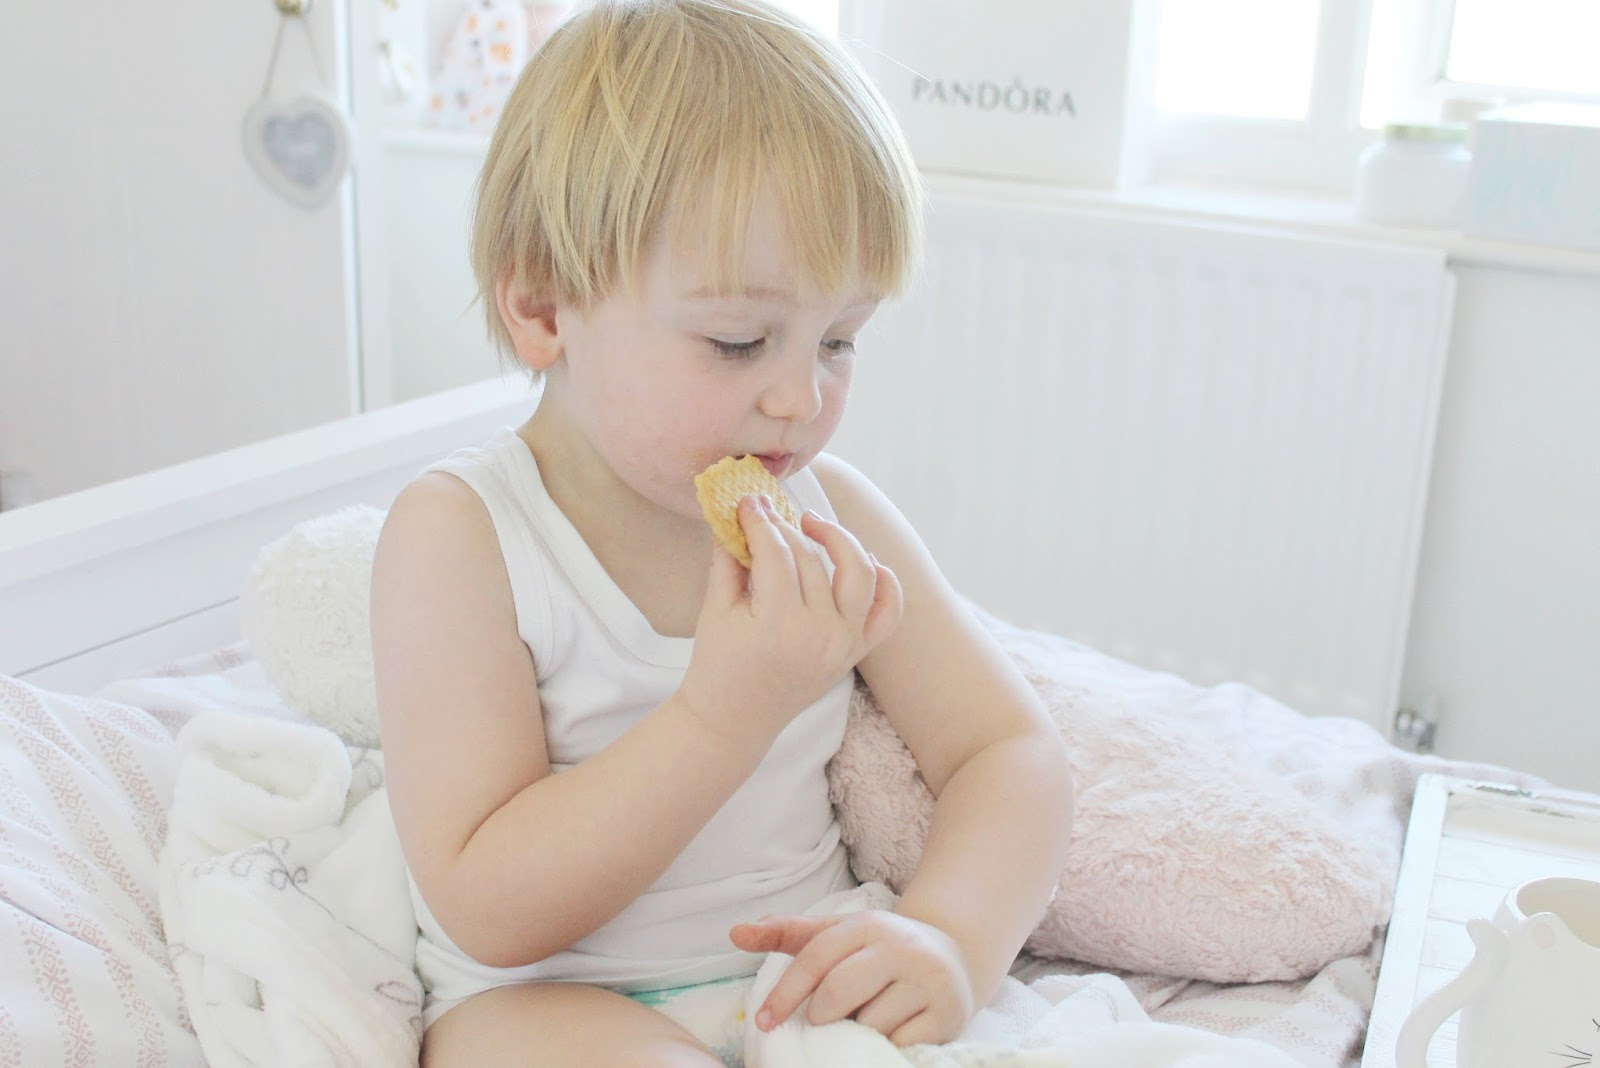 Toddler baby shabby chic blog update